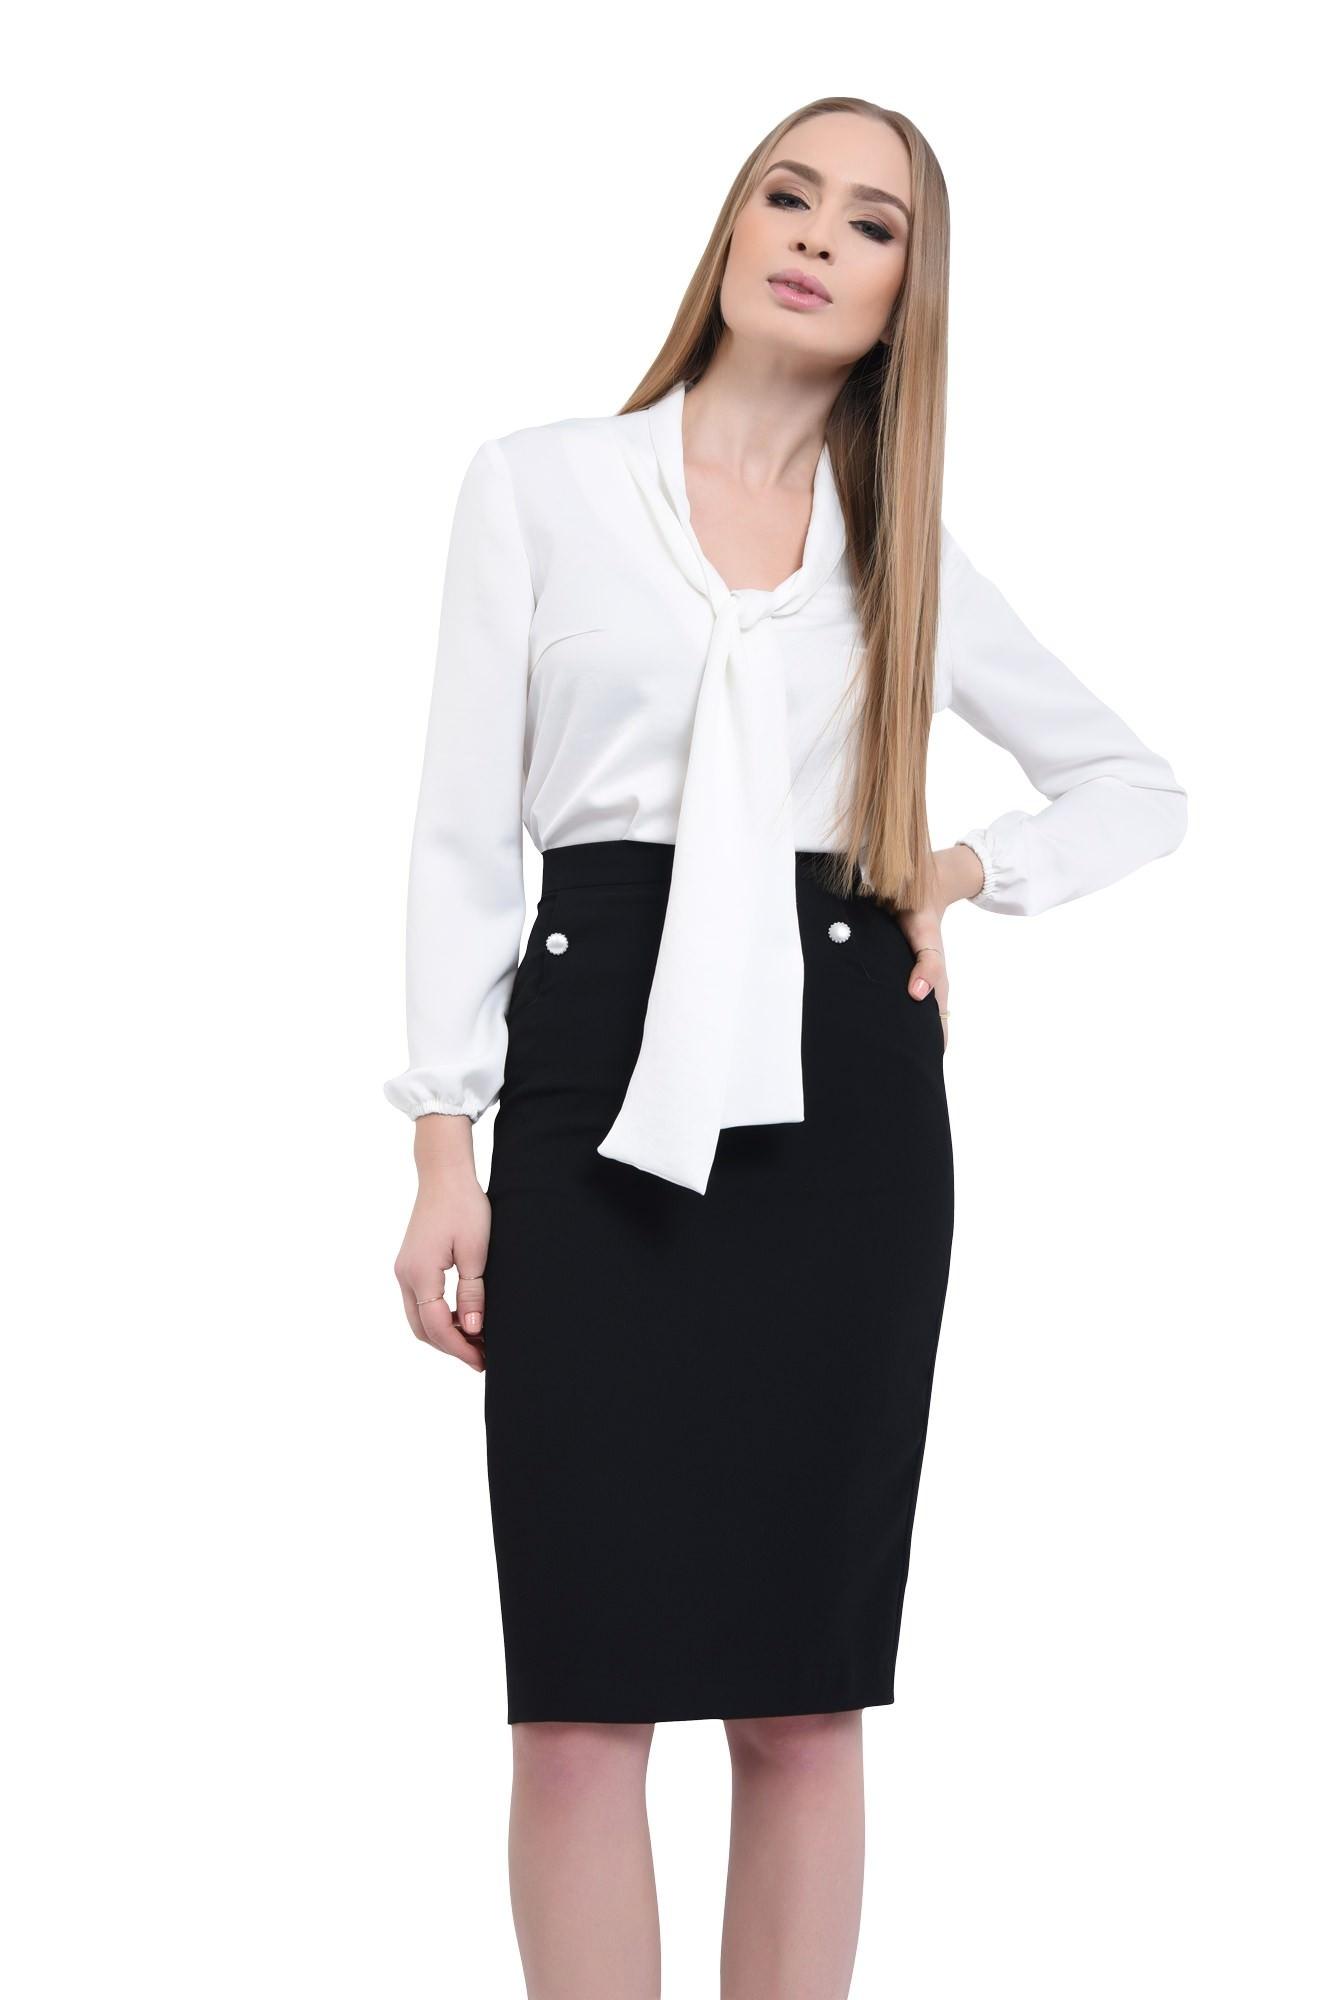 0 - Bluza office, alb, maneci lungi